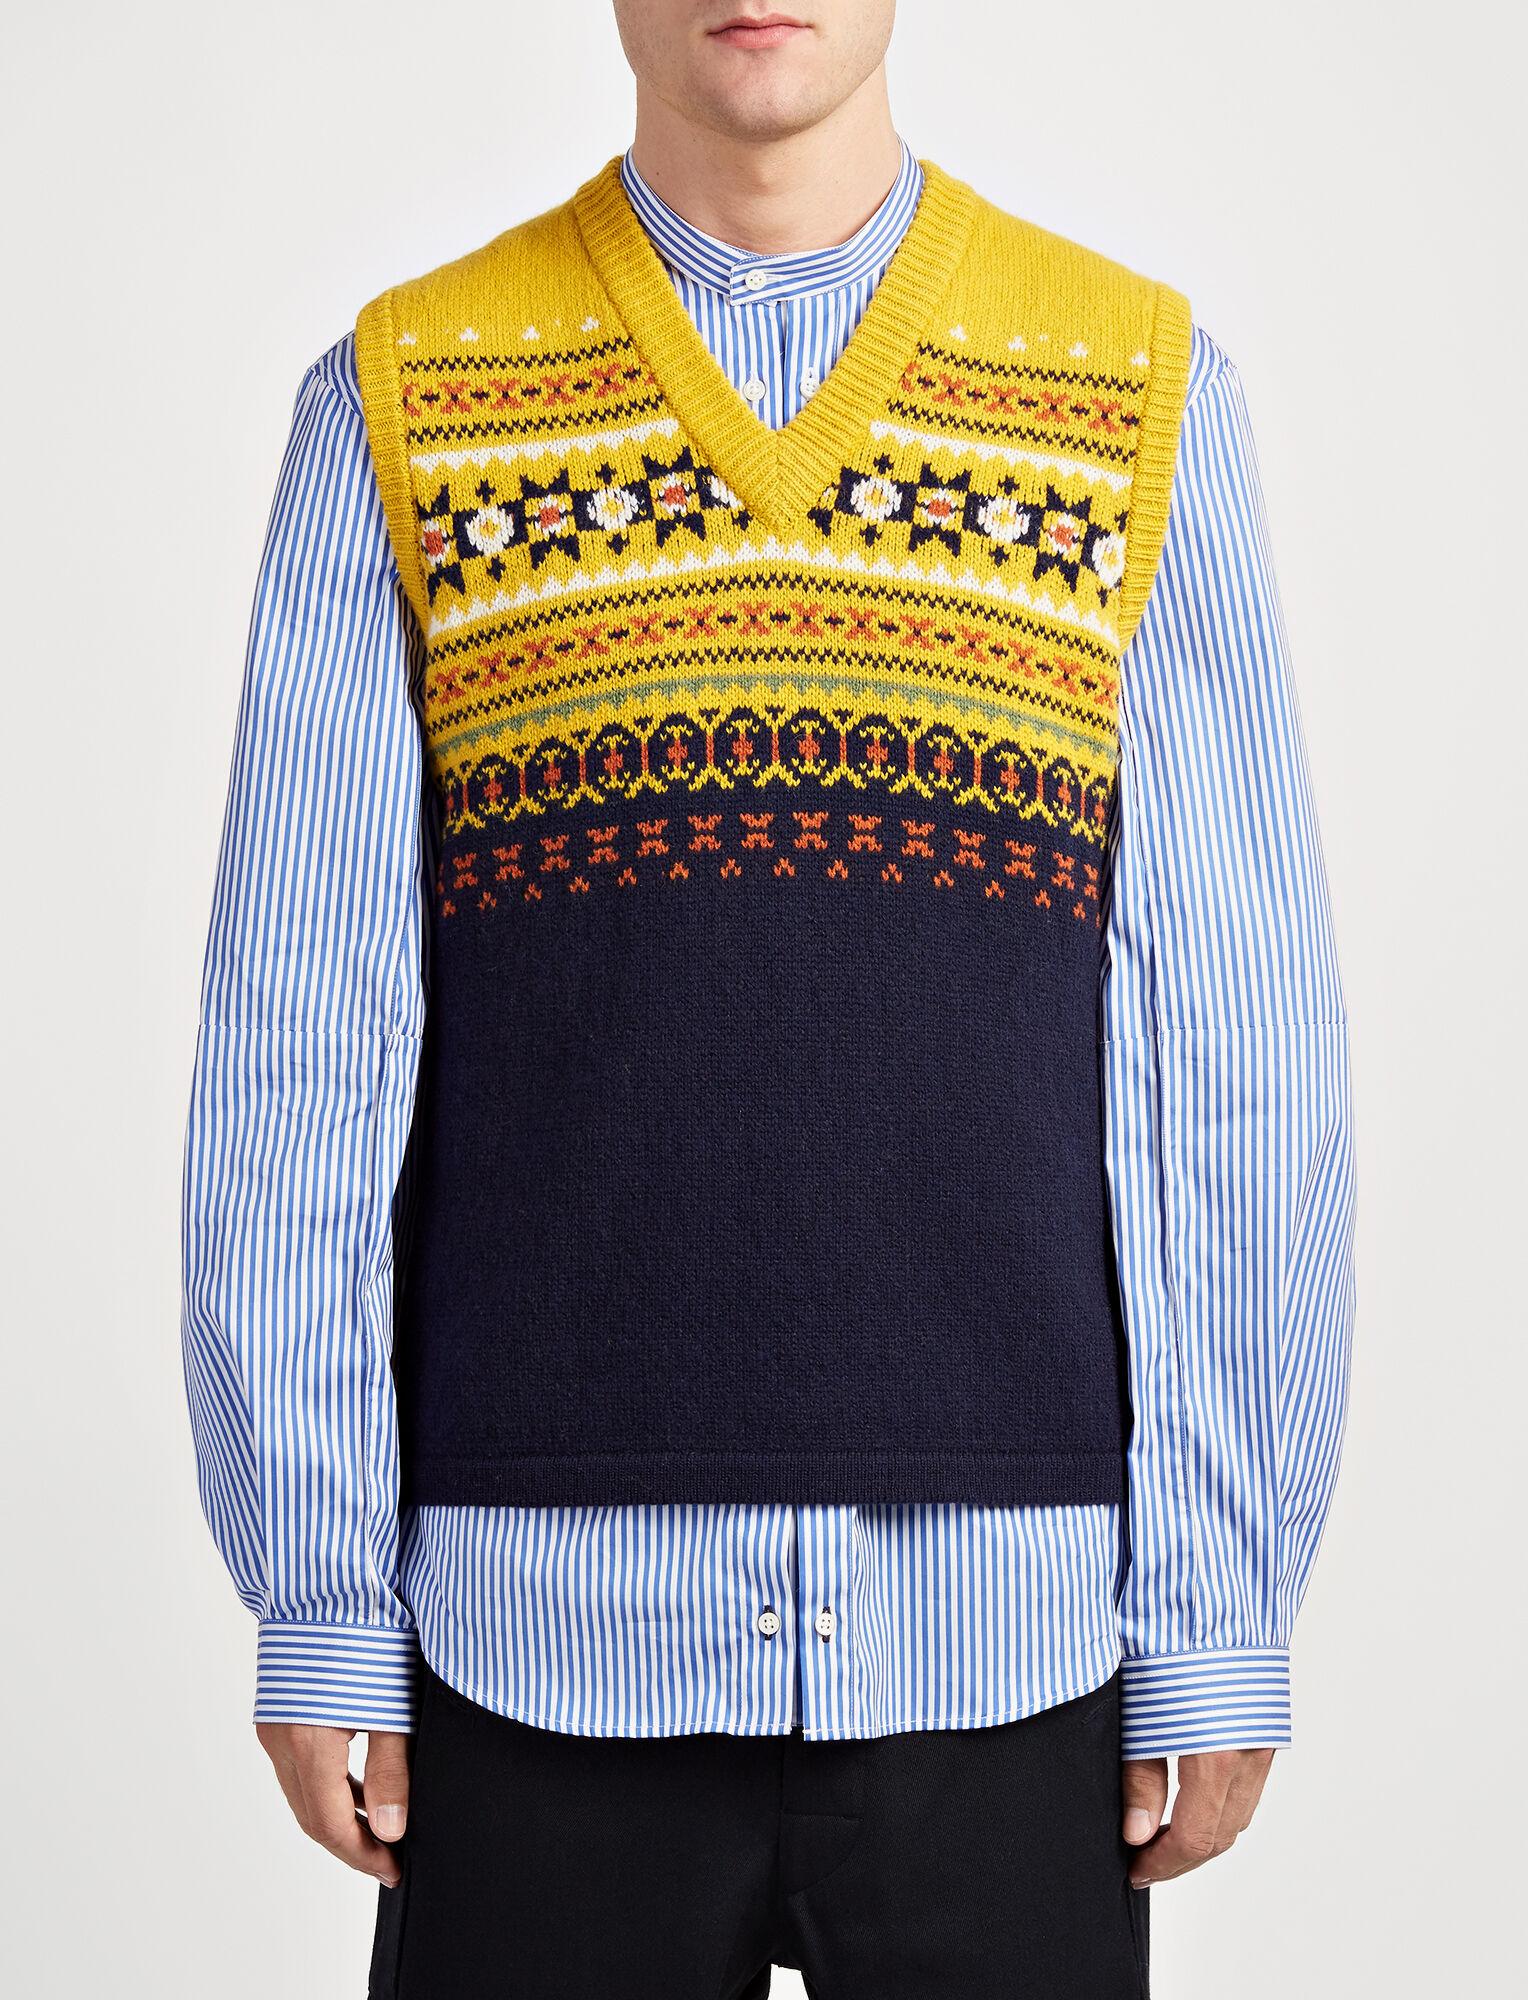 Fair Isle Knit V Neck Sleveless Sweater in Yolk | JOSEPH